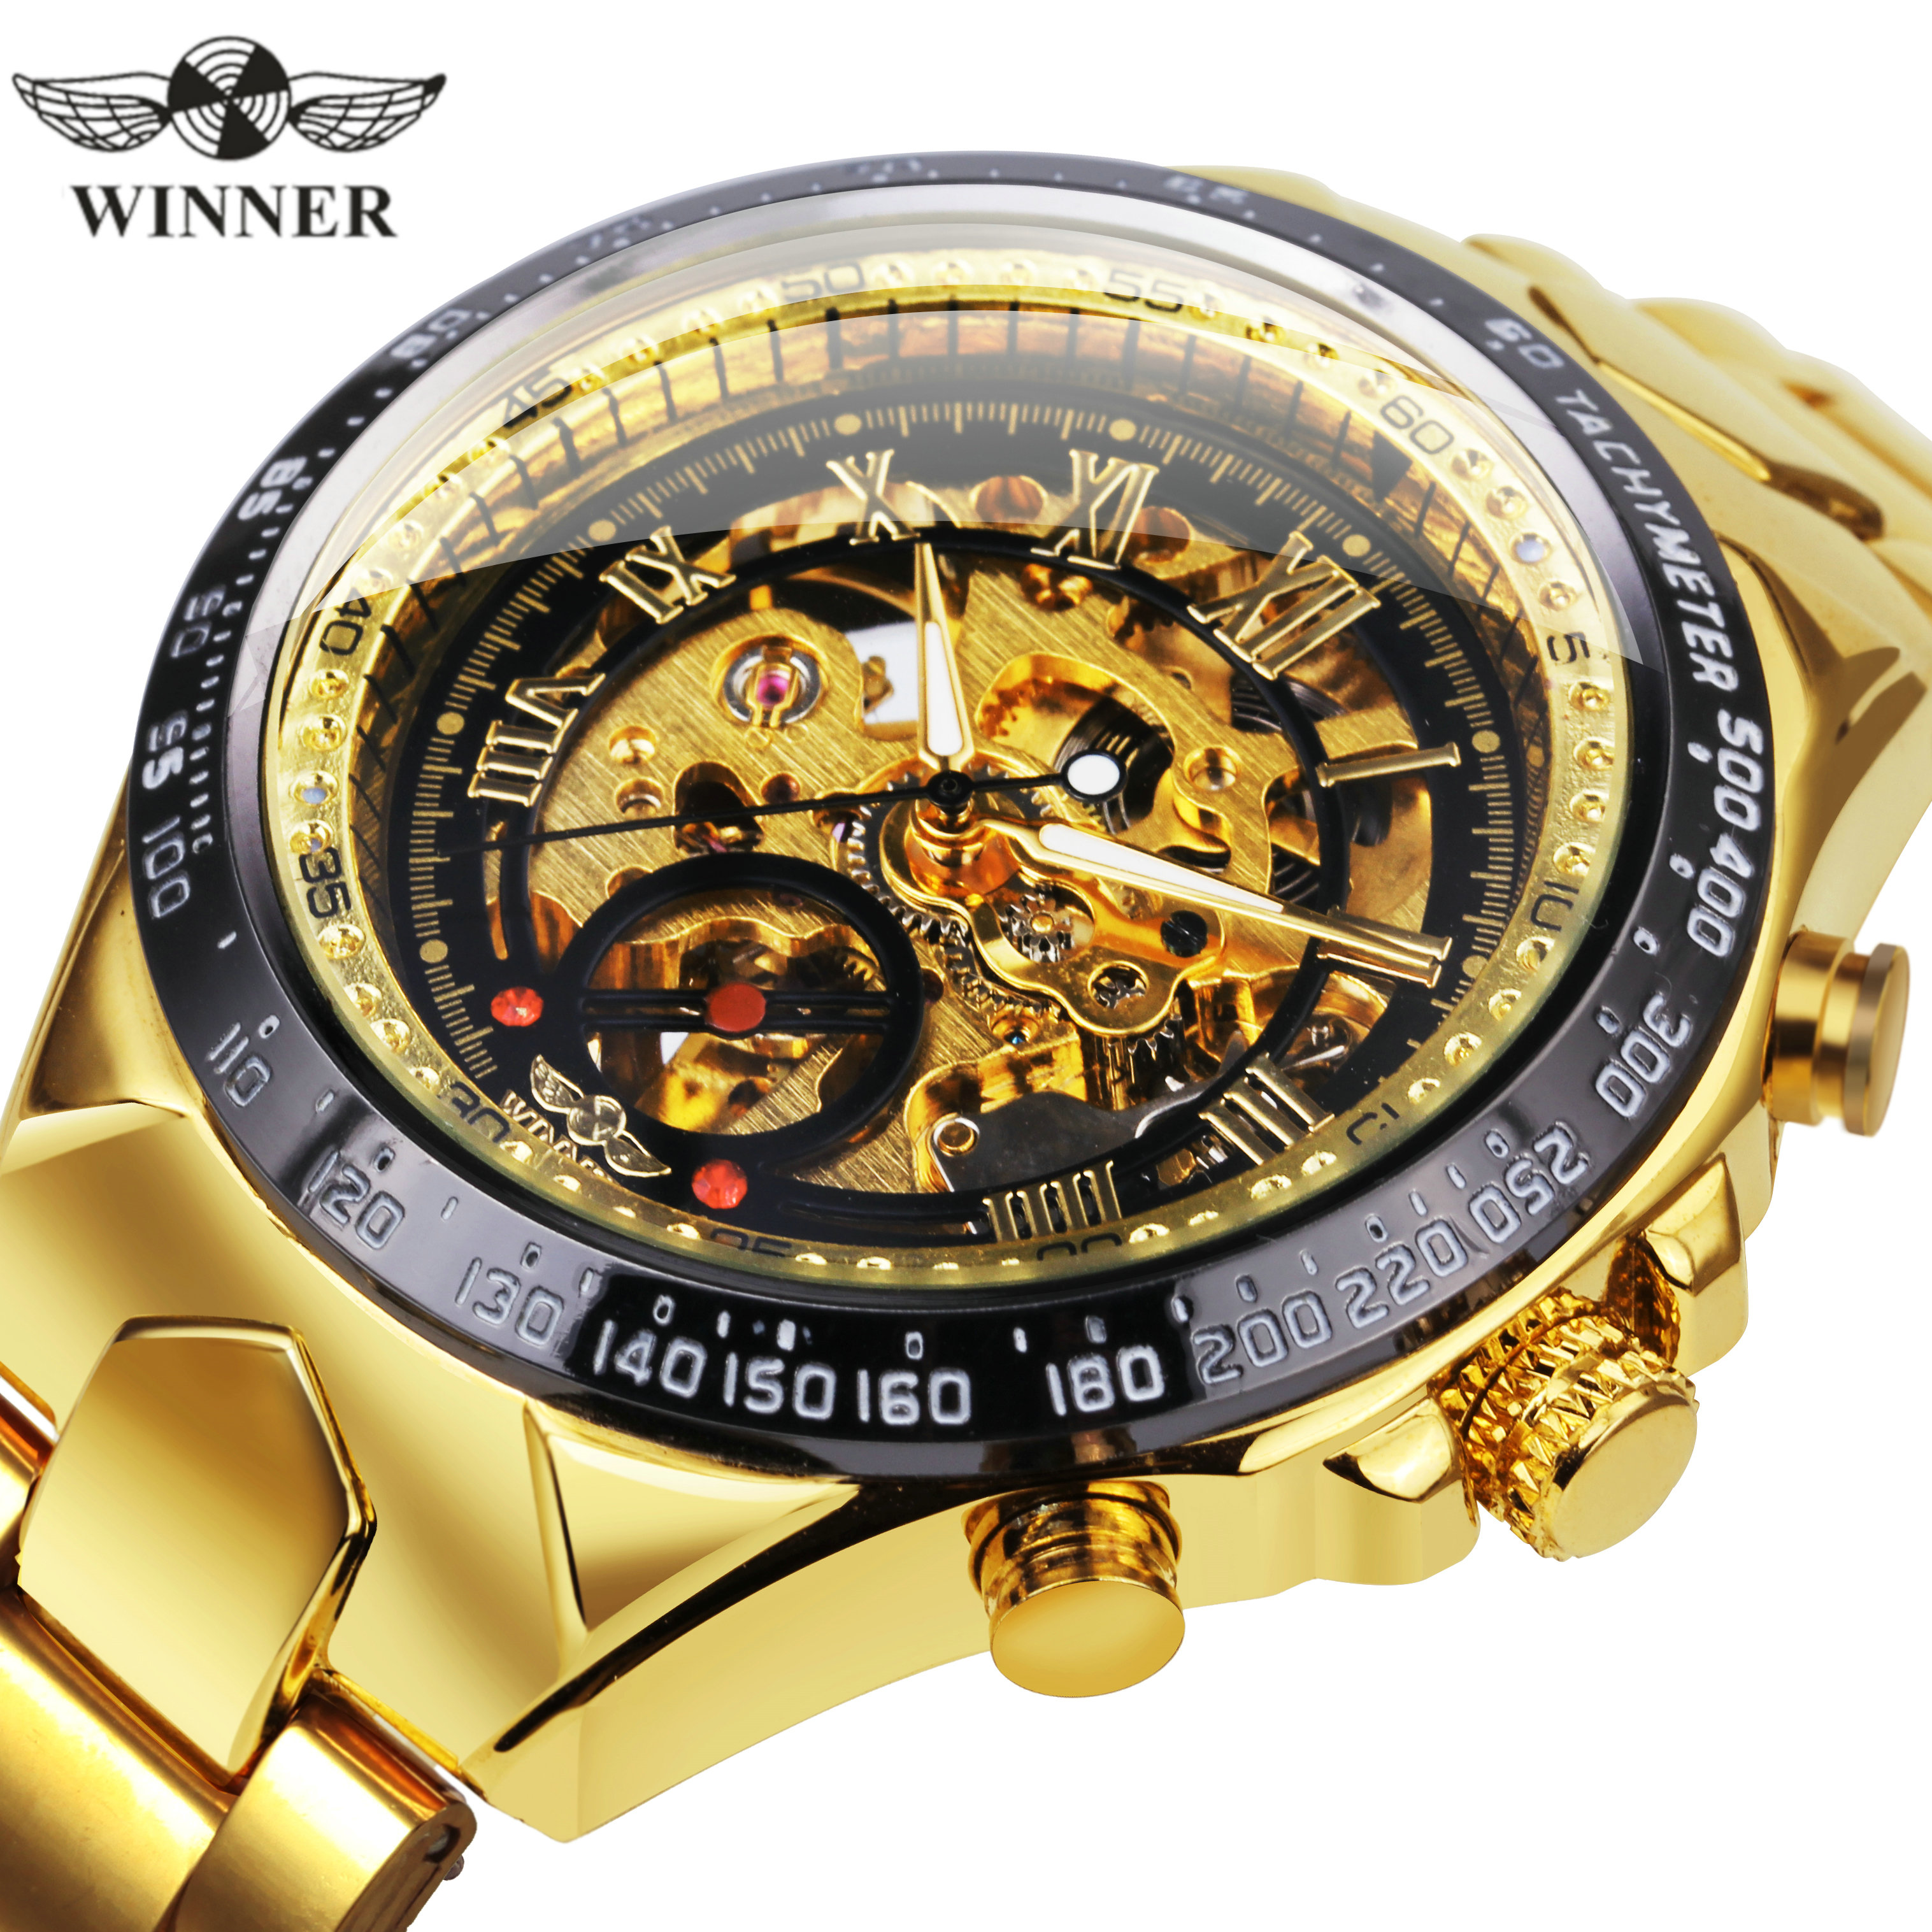 WINNER Official Vintage Fashion Men Mechanical Watches Metal Strap Top Brand Luxury Best Selling Vintage Retro Wristwatches +BOXMechanical Watches   -